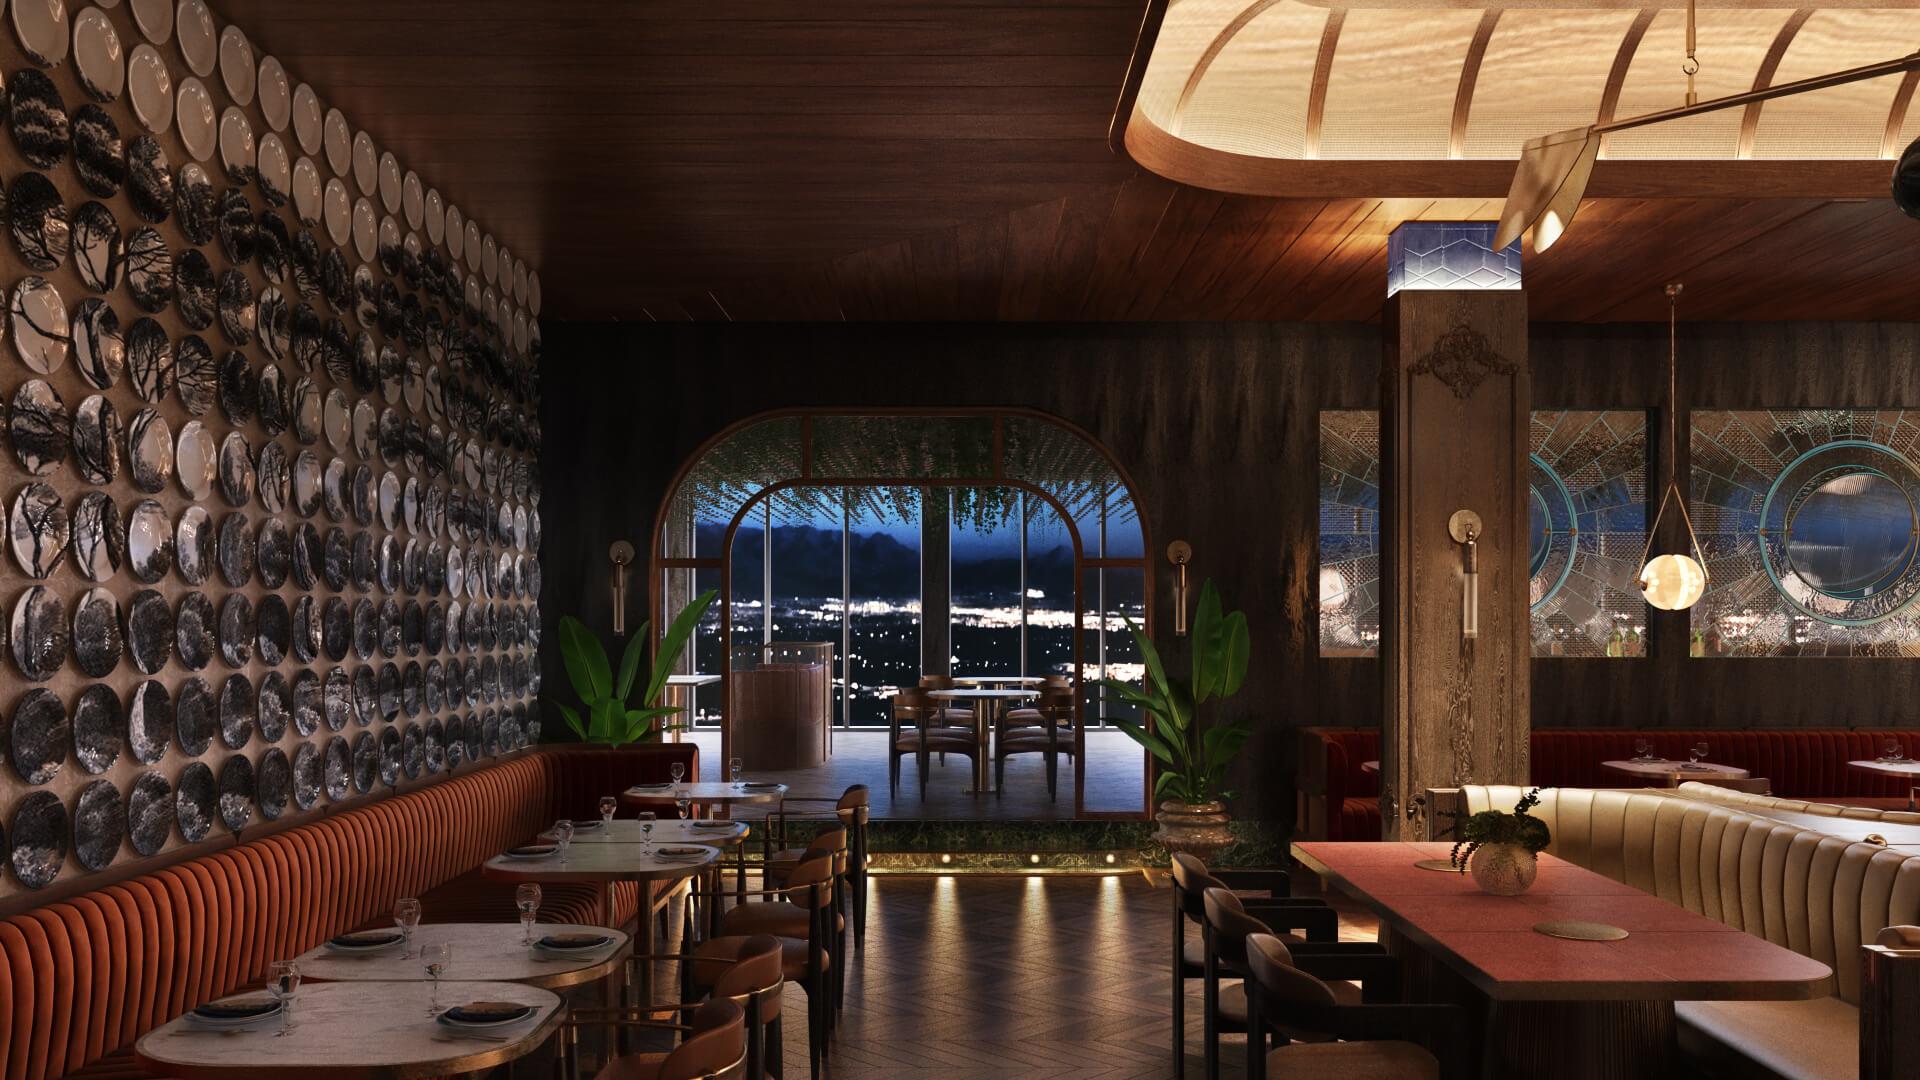 Restaurant 3D Rendering Intermediate Results